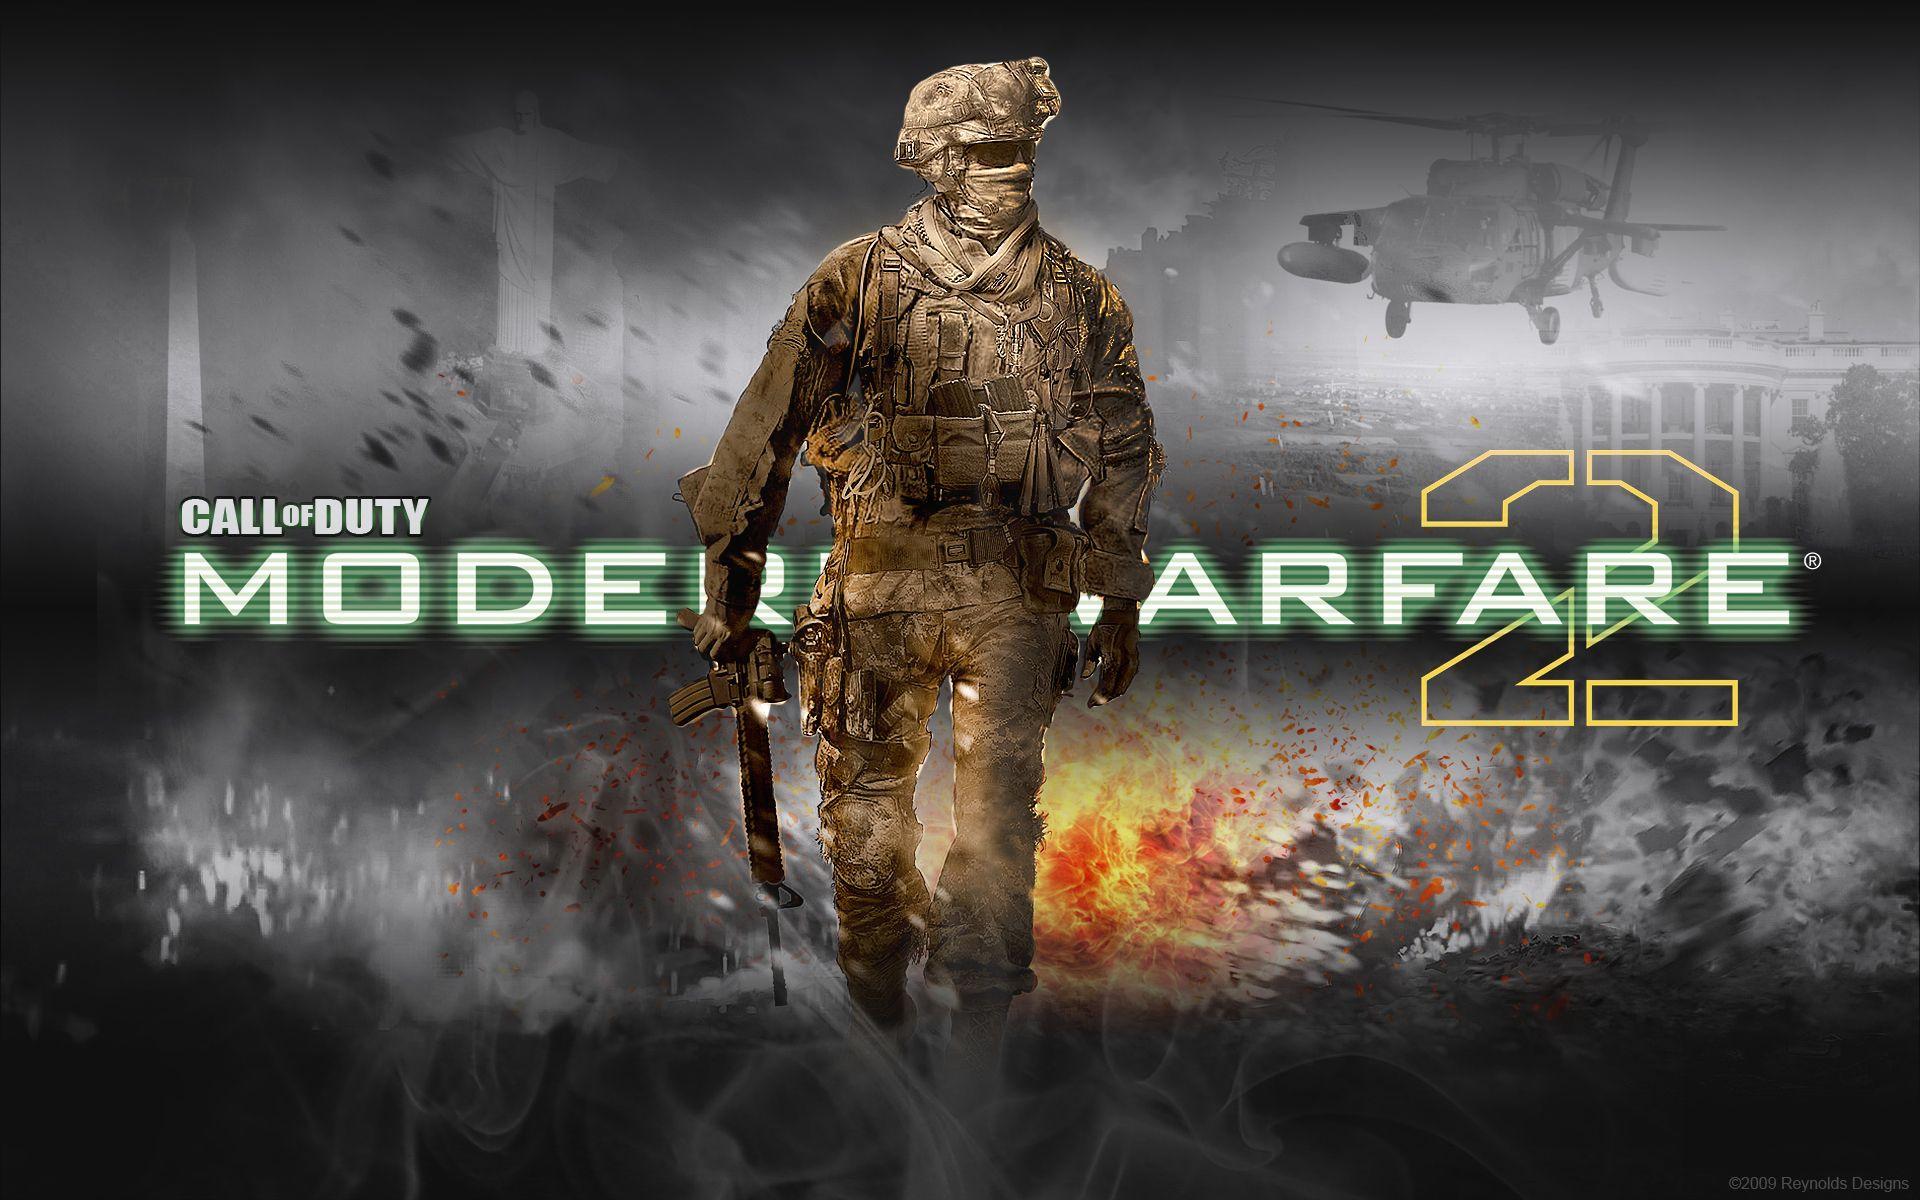 Call of Duty Modern Warfare HD HD desktop wallpaper High